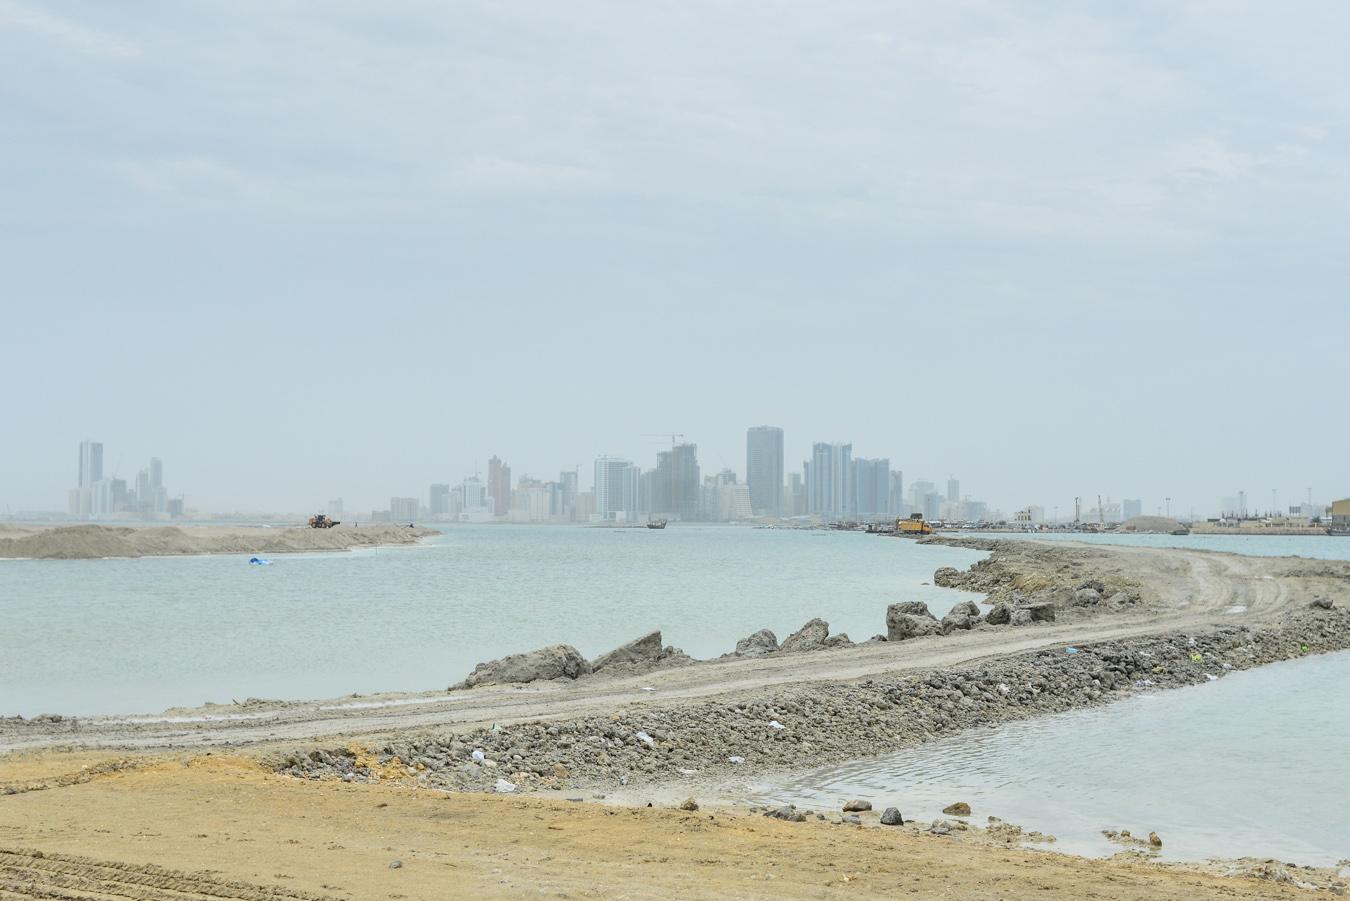 View of the sea surrounding Bahrain